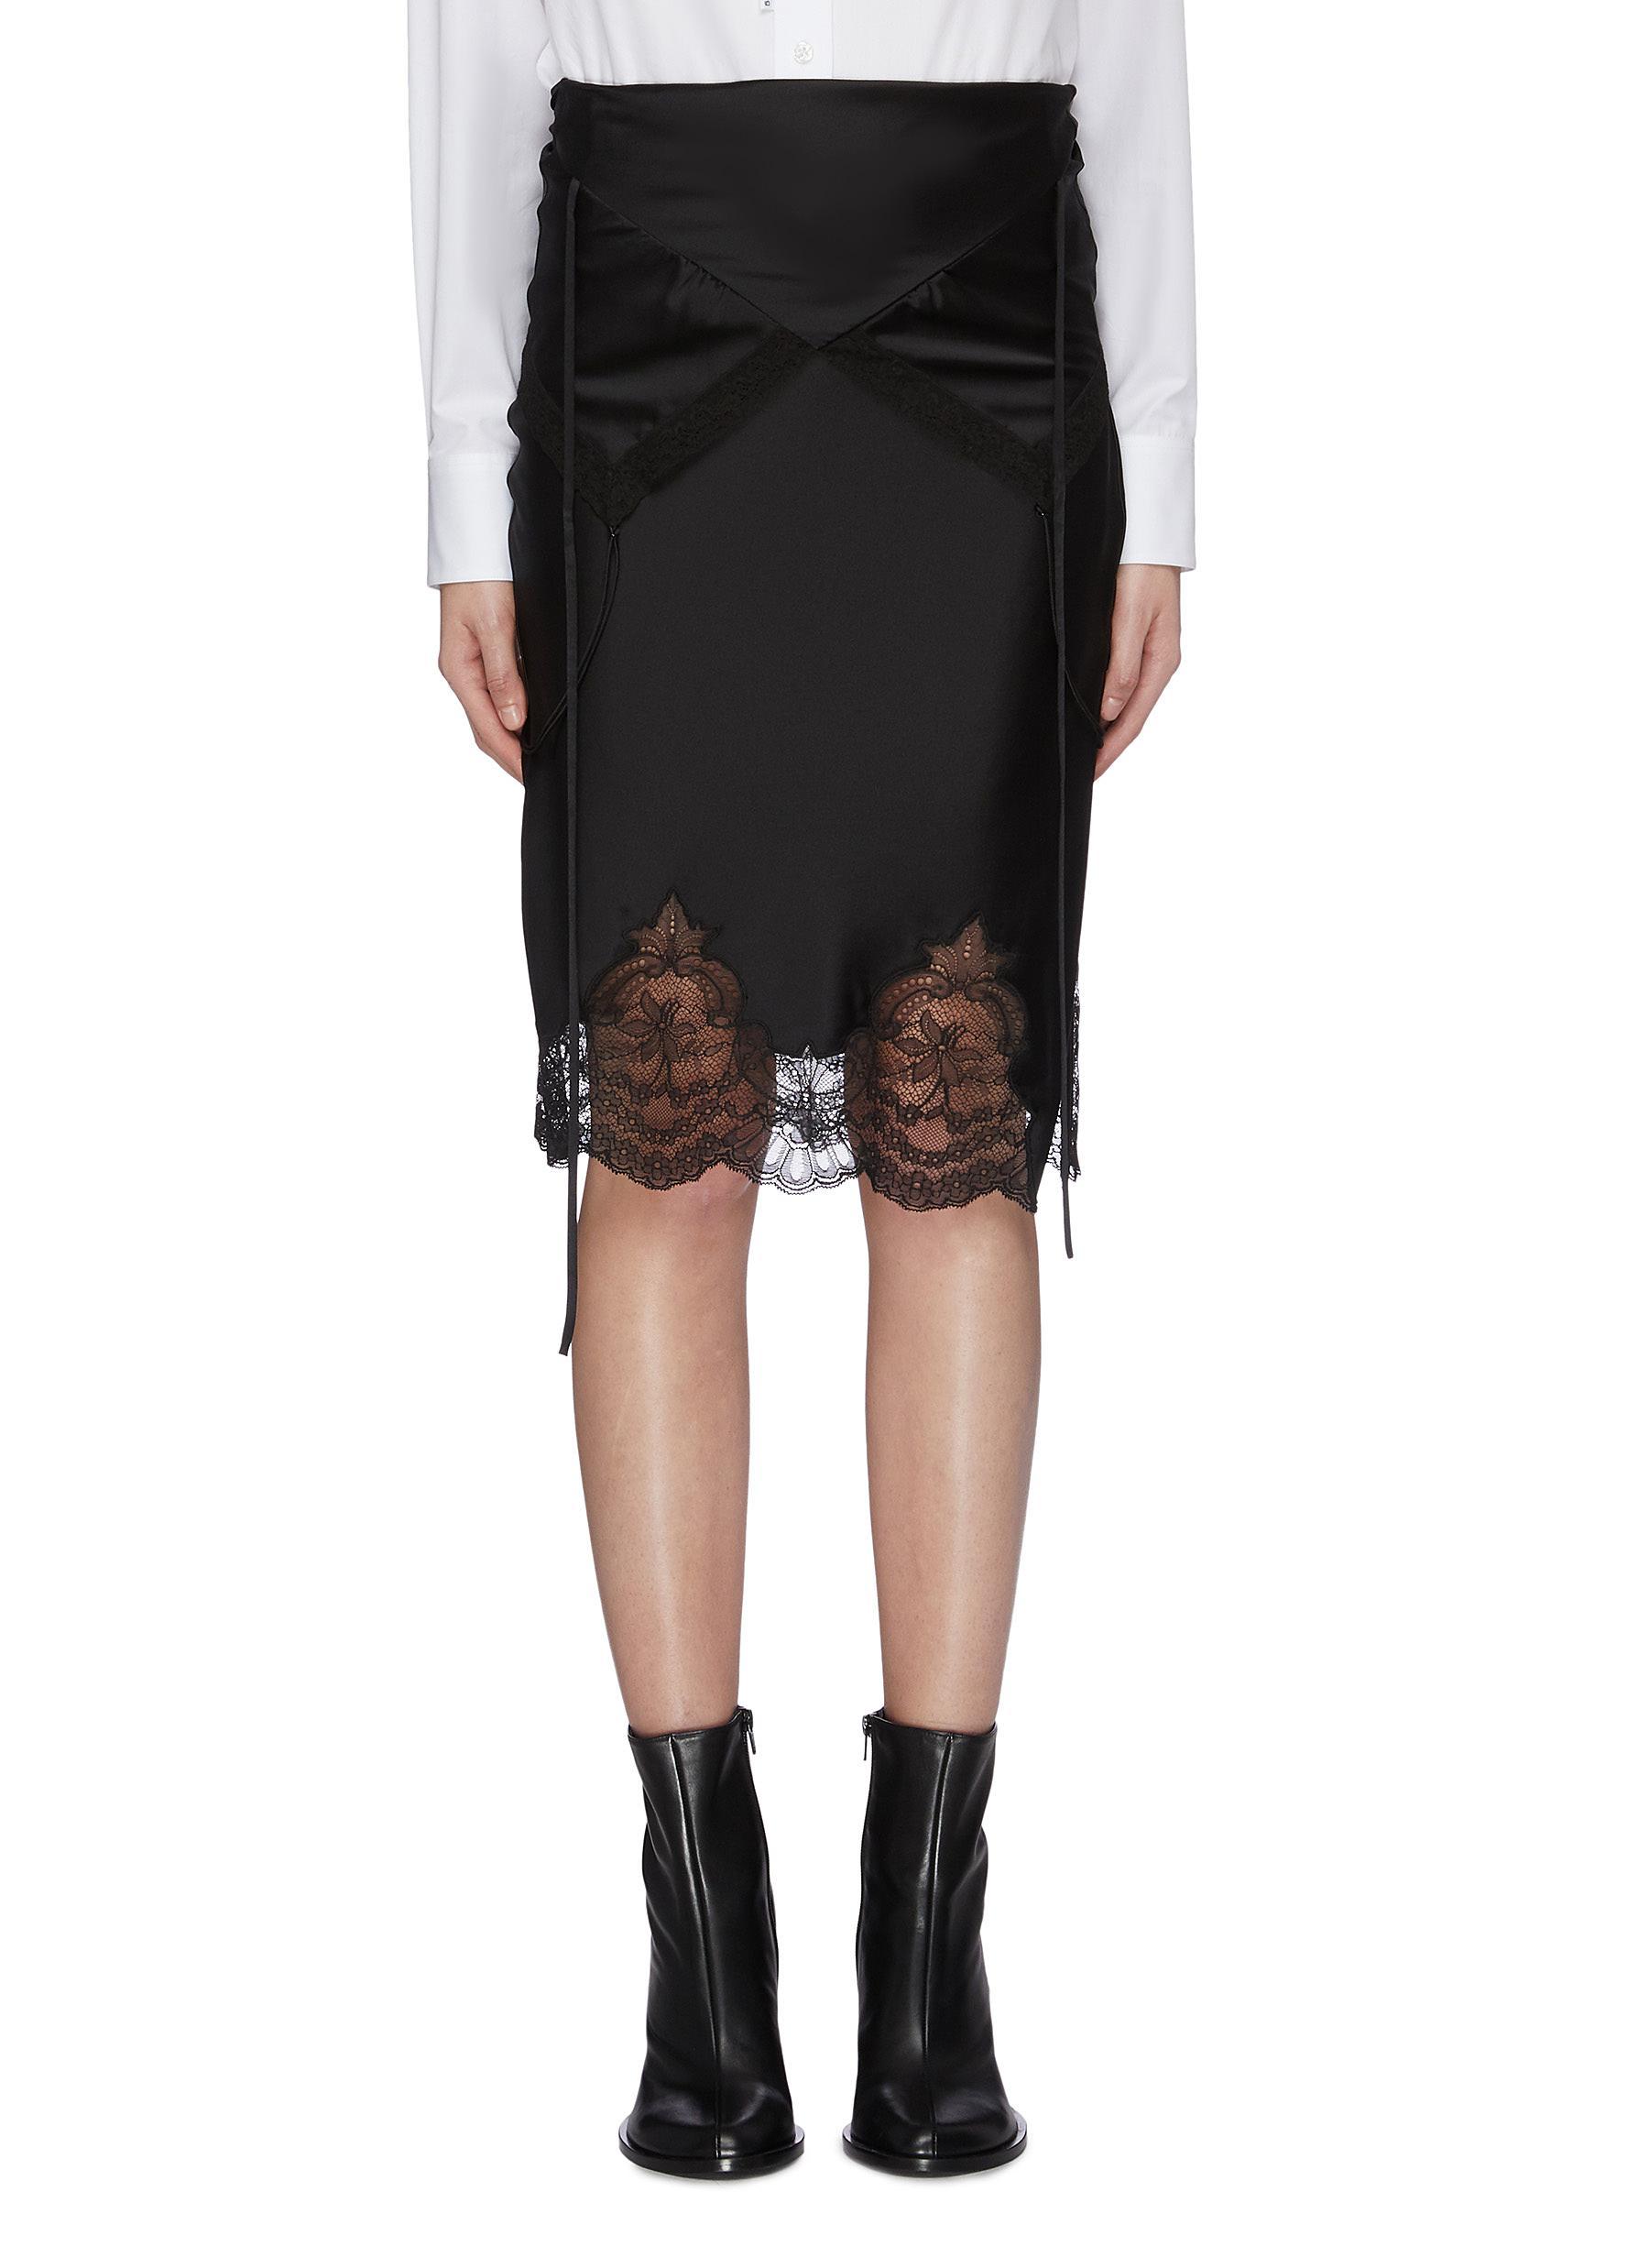 Lace panel scallop hem satin skirt by Alexanderwang